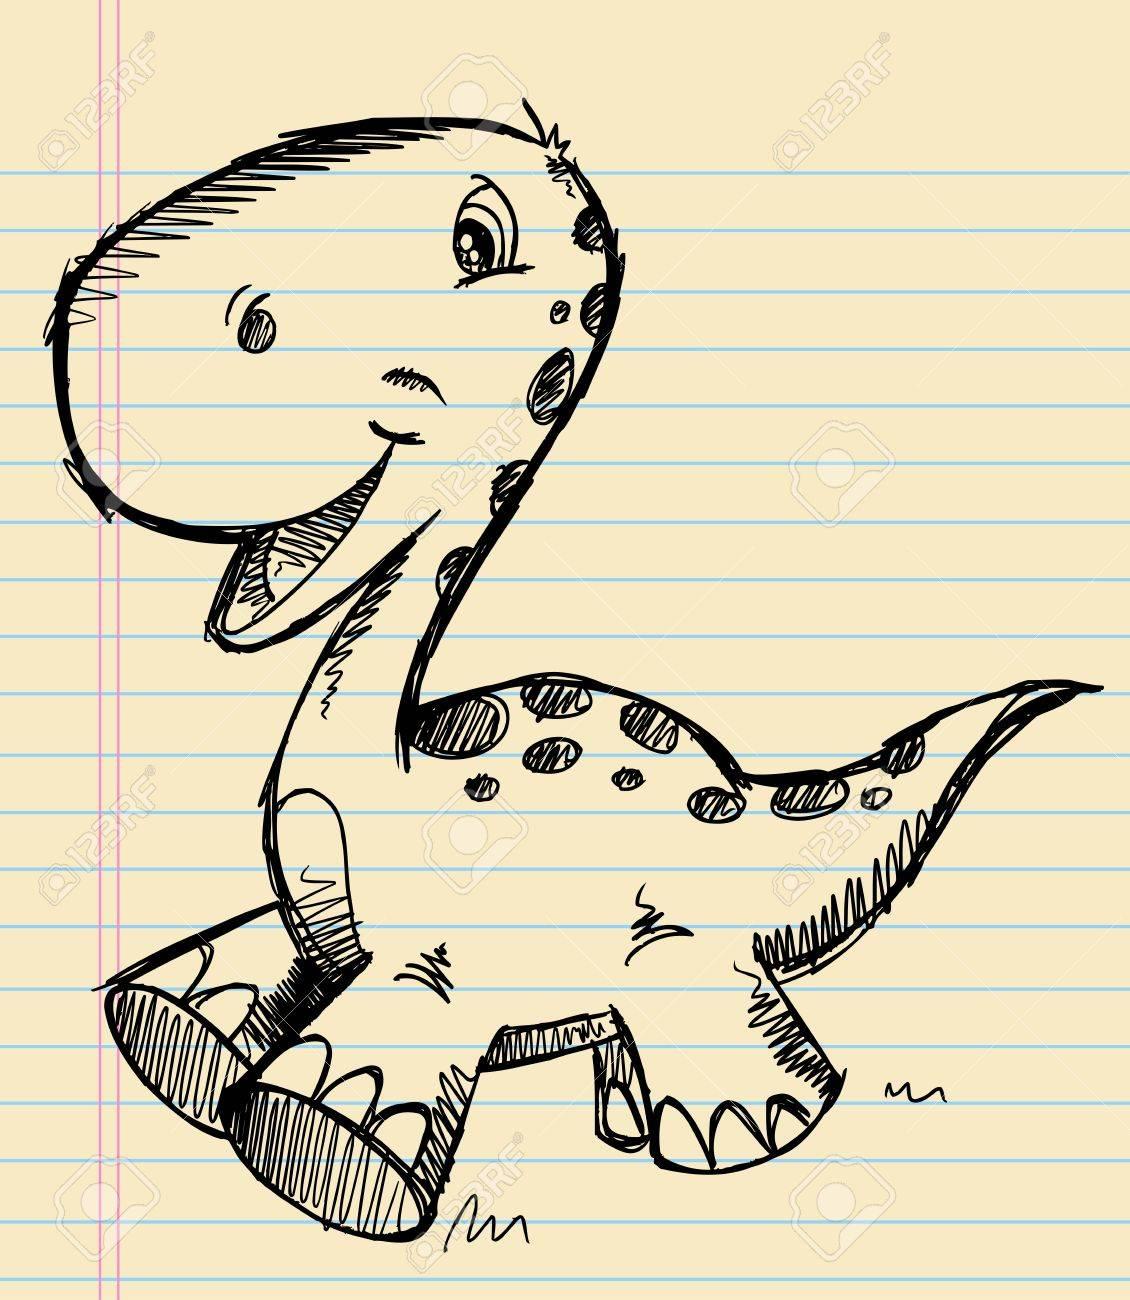 Dinosaur Doodle Sketch  Art Stock Vector - 15397914